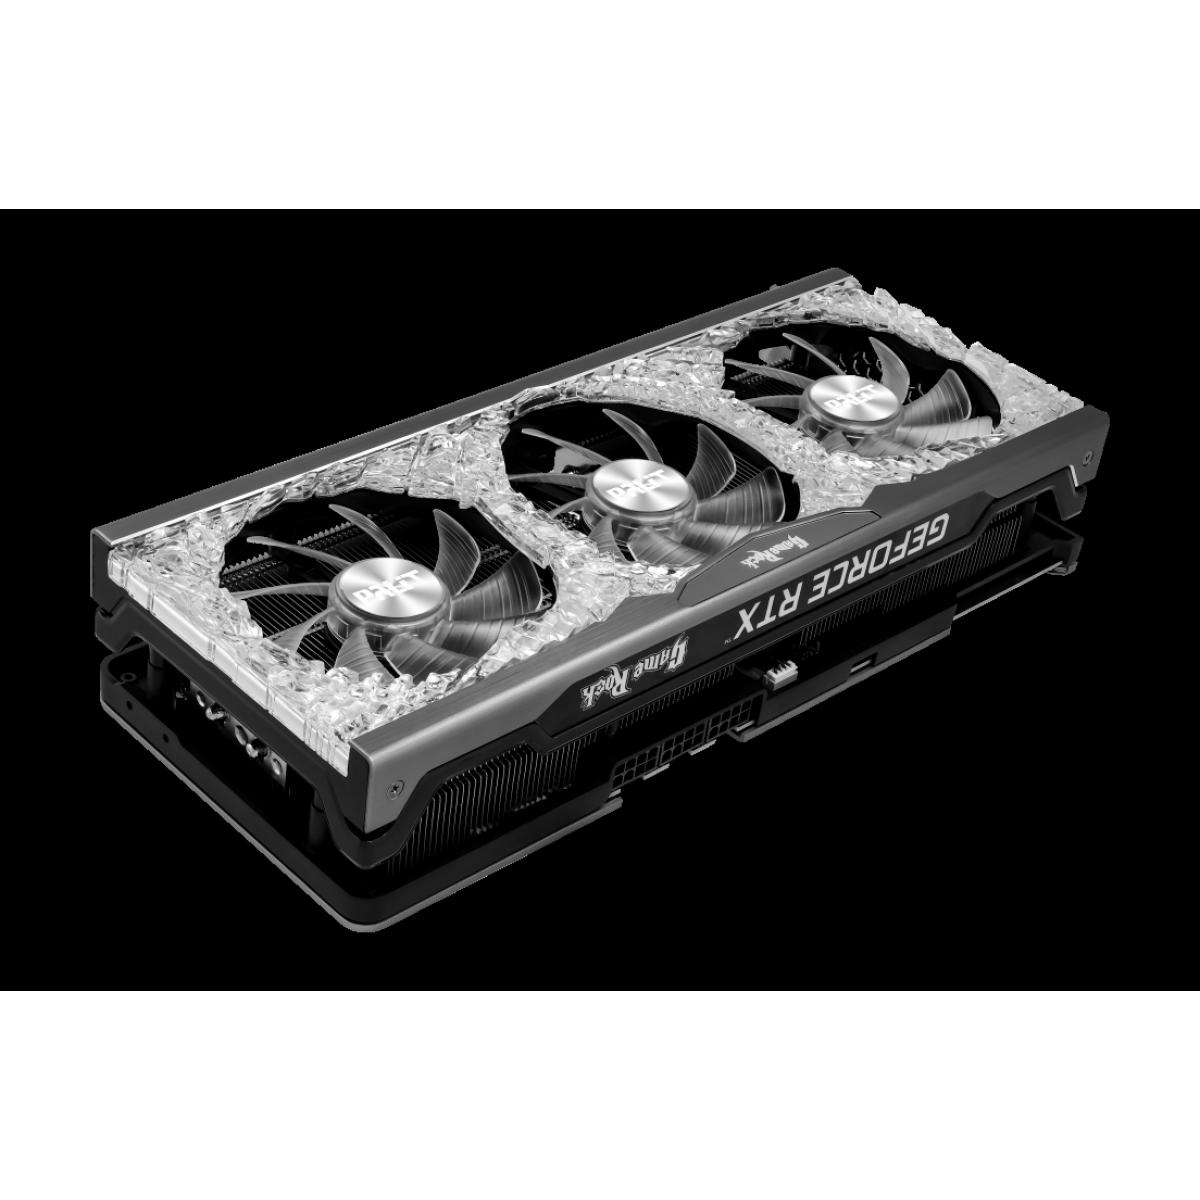 Placa de Vídeo Palit NVIDIA GeForce RTX 3090 GameRock, 24GB, GDDR6X, 384bit, NED3090T19SB-1021G